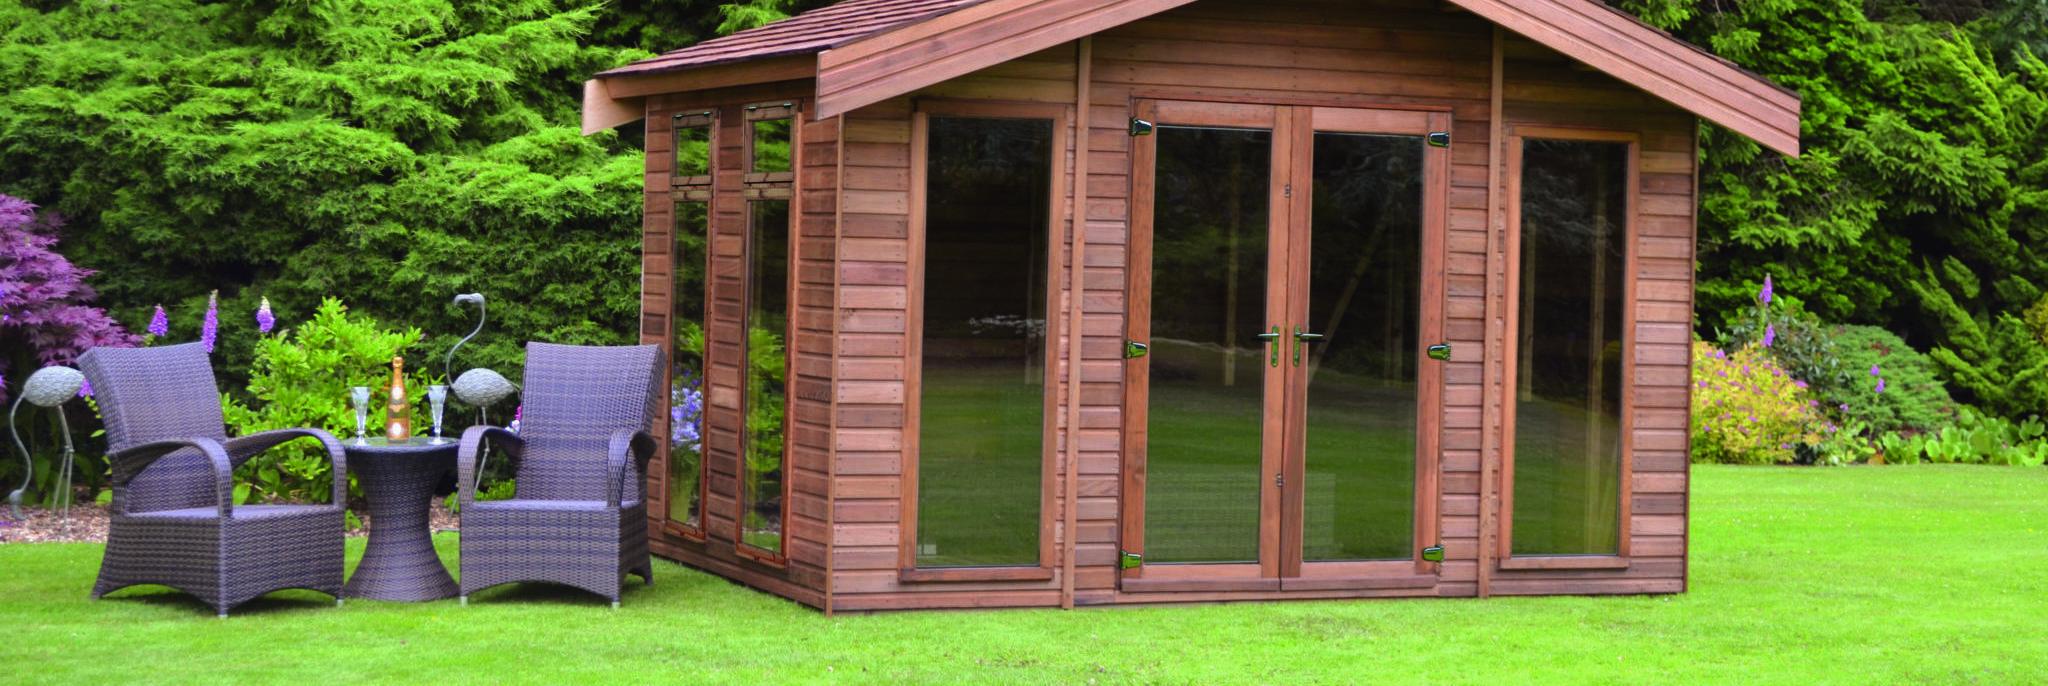 Regency Riviera Summerhouse 12' x 8'with optional cedar cladding and cedar shingle roof